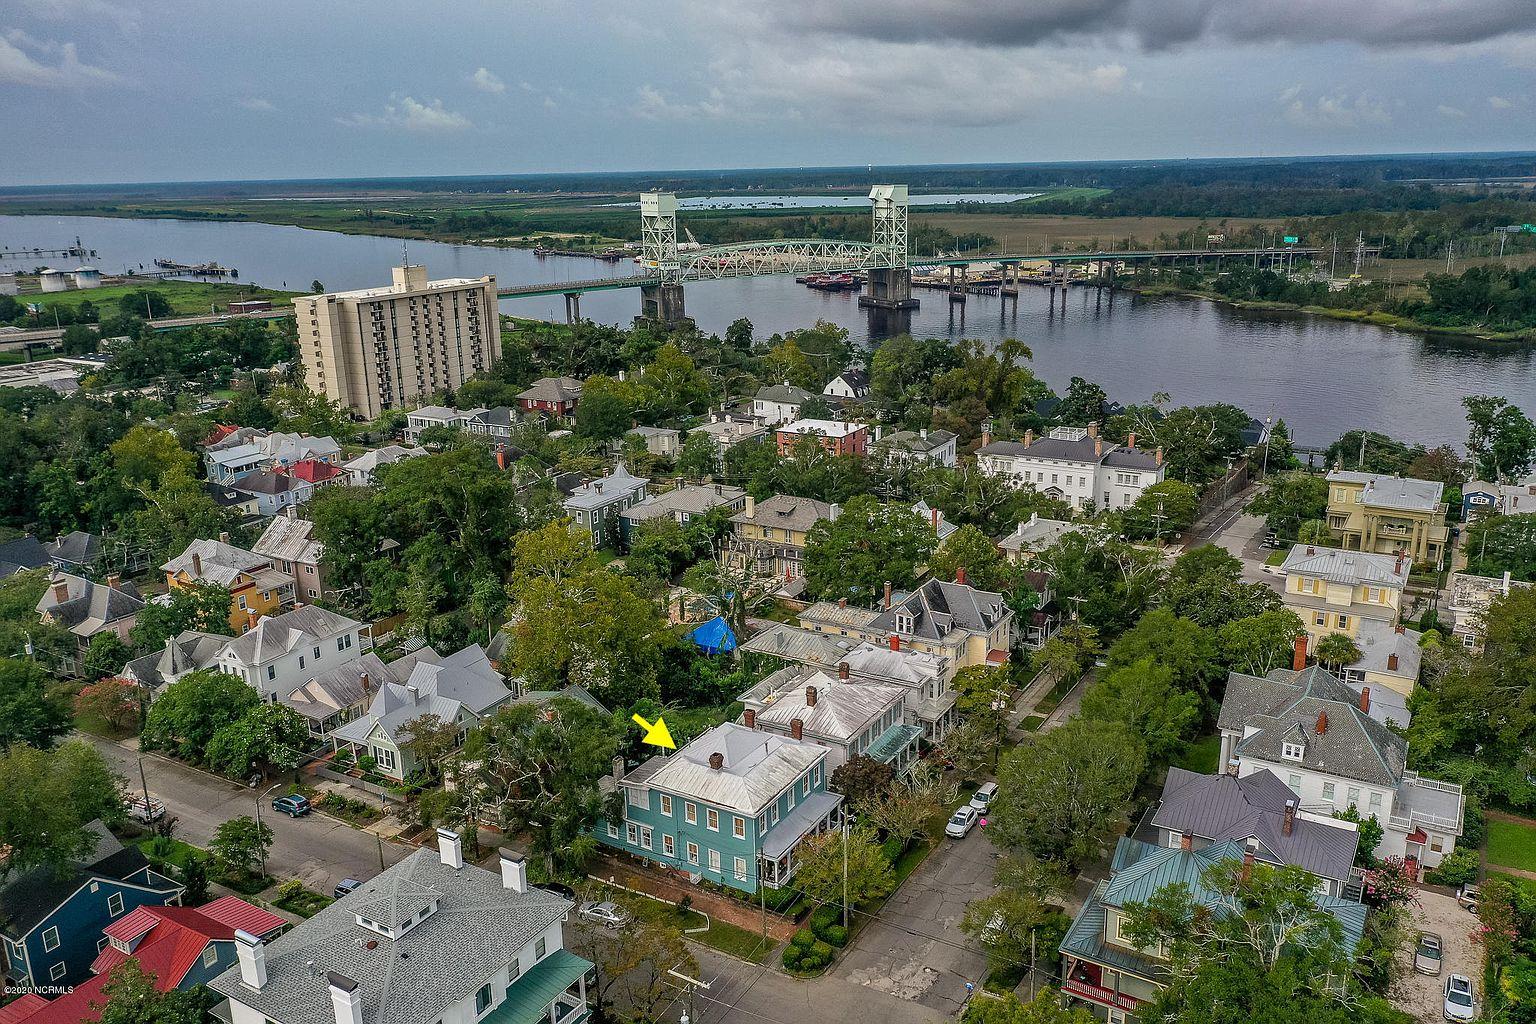 120 Nun St, Wilmington, NC 28401-4